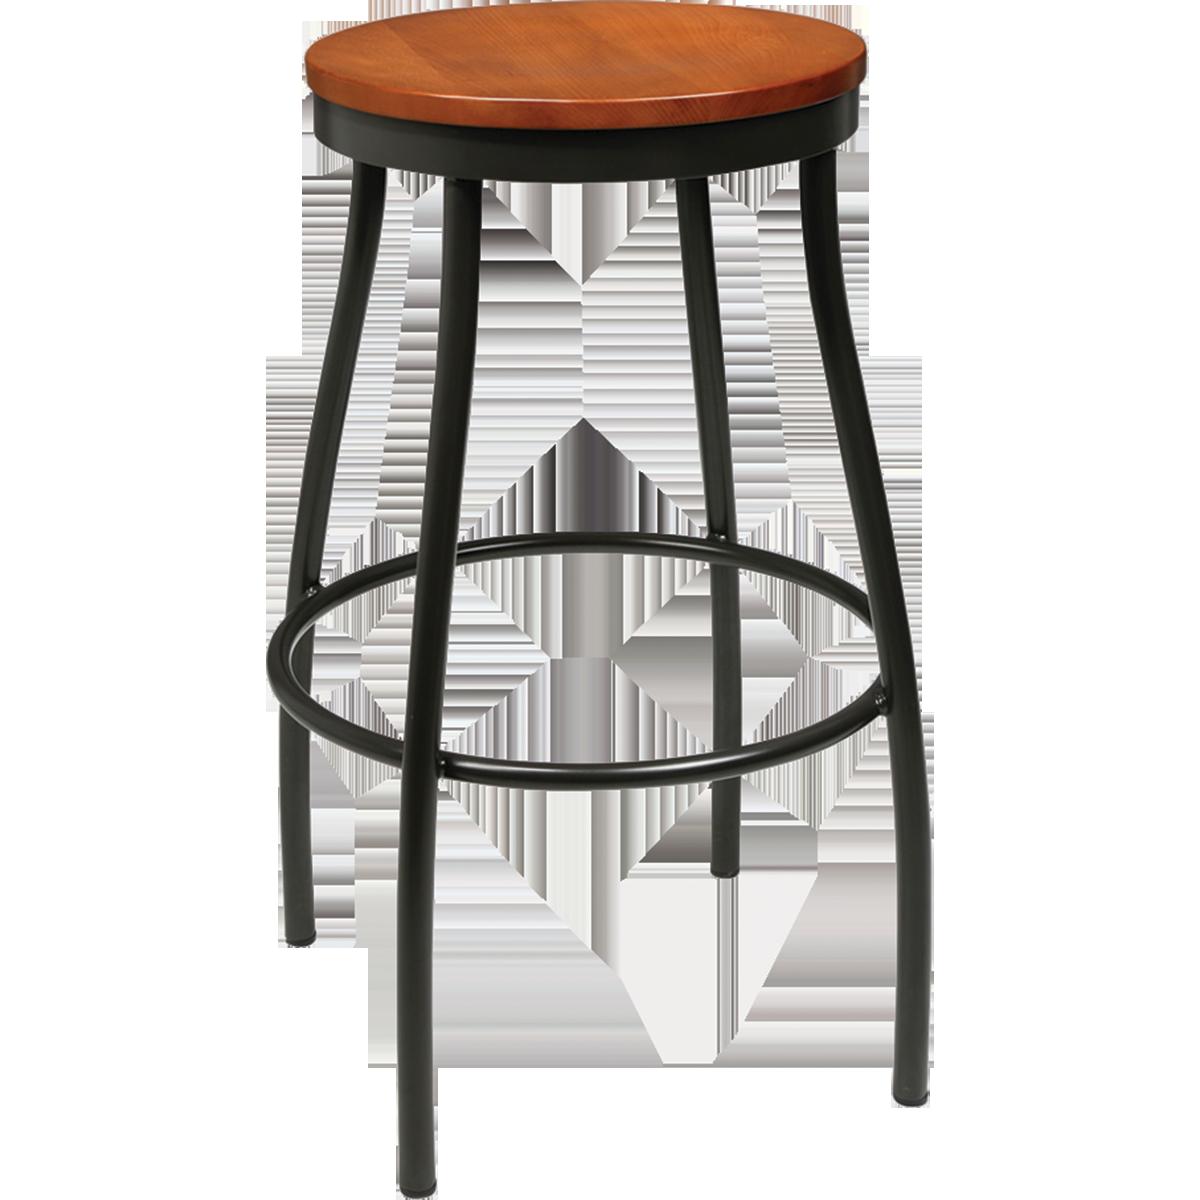 Top Metal Rustic Wood Backless Bar Stool | Millennium Seating | USA  WQ58